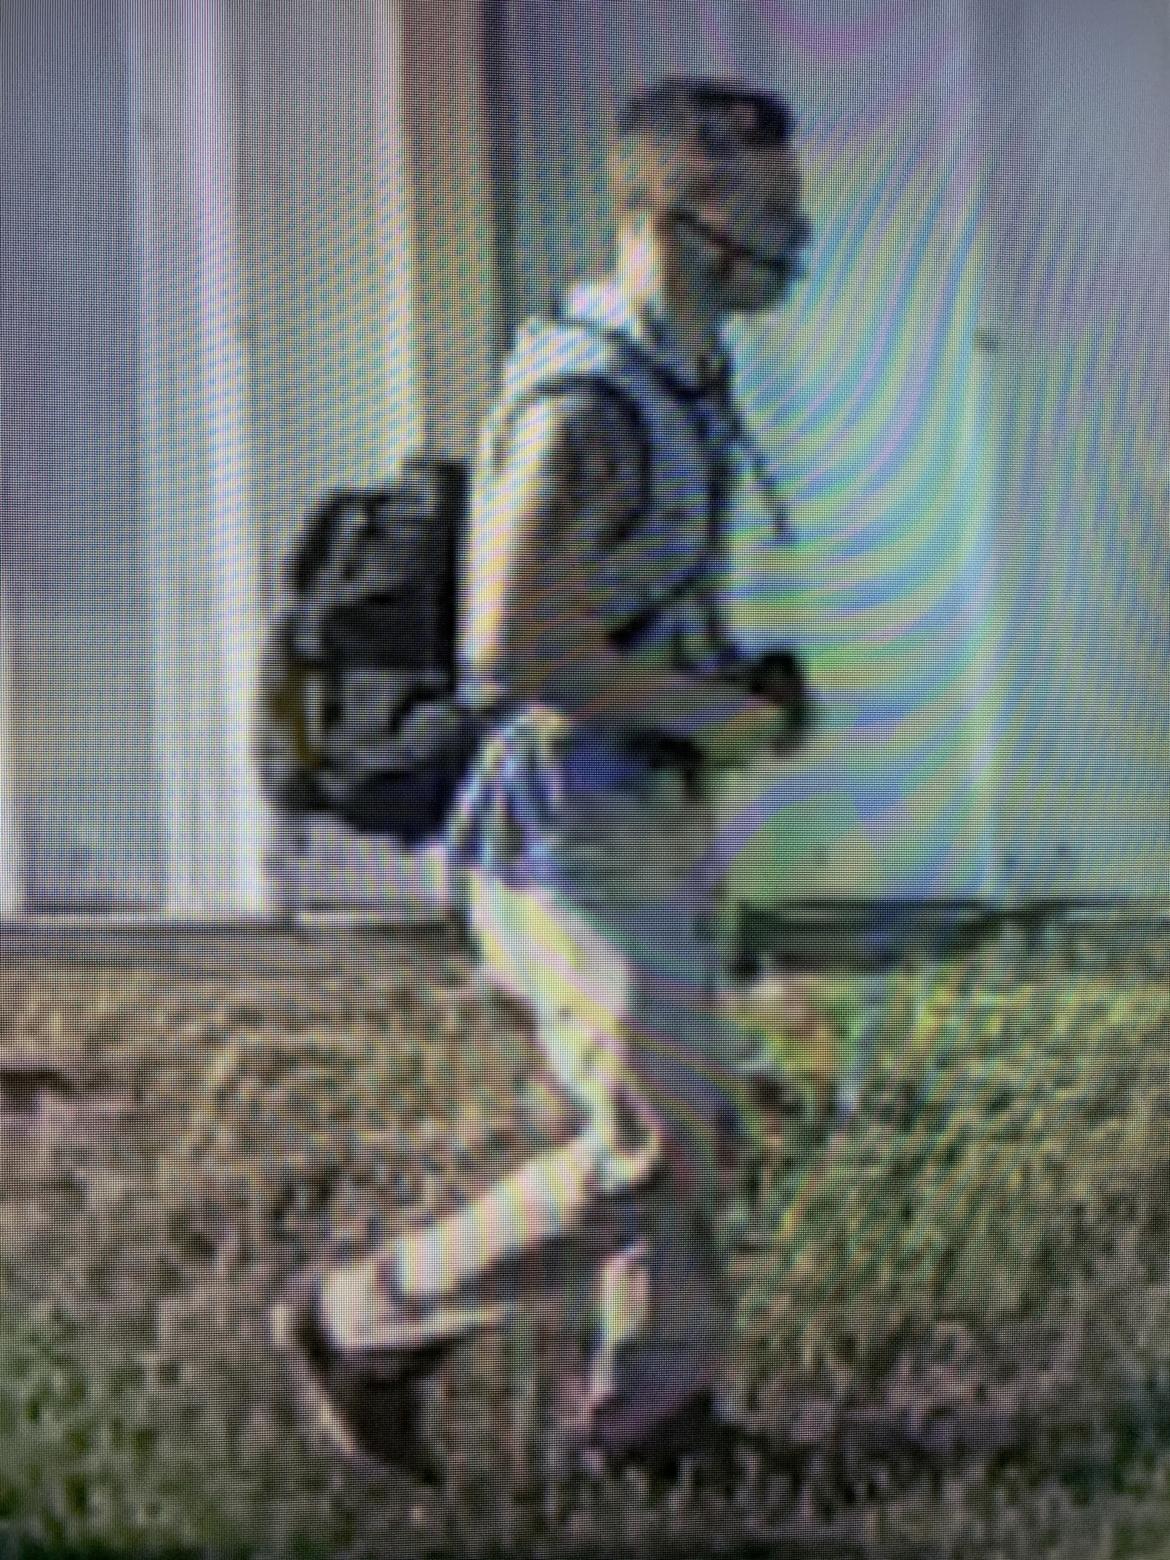 21006053-suspect-photos-C-scaled.jpg